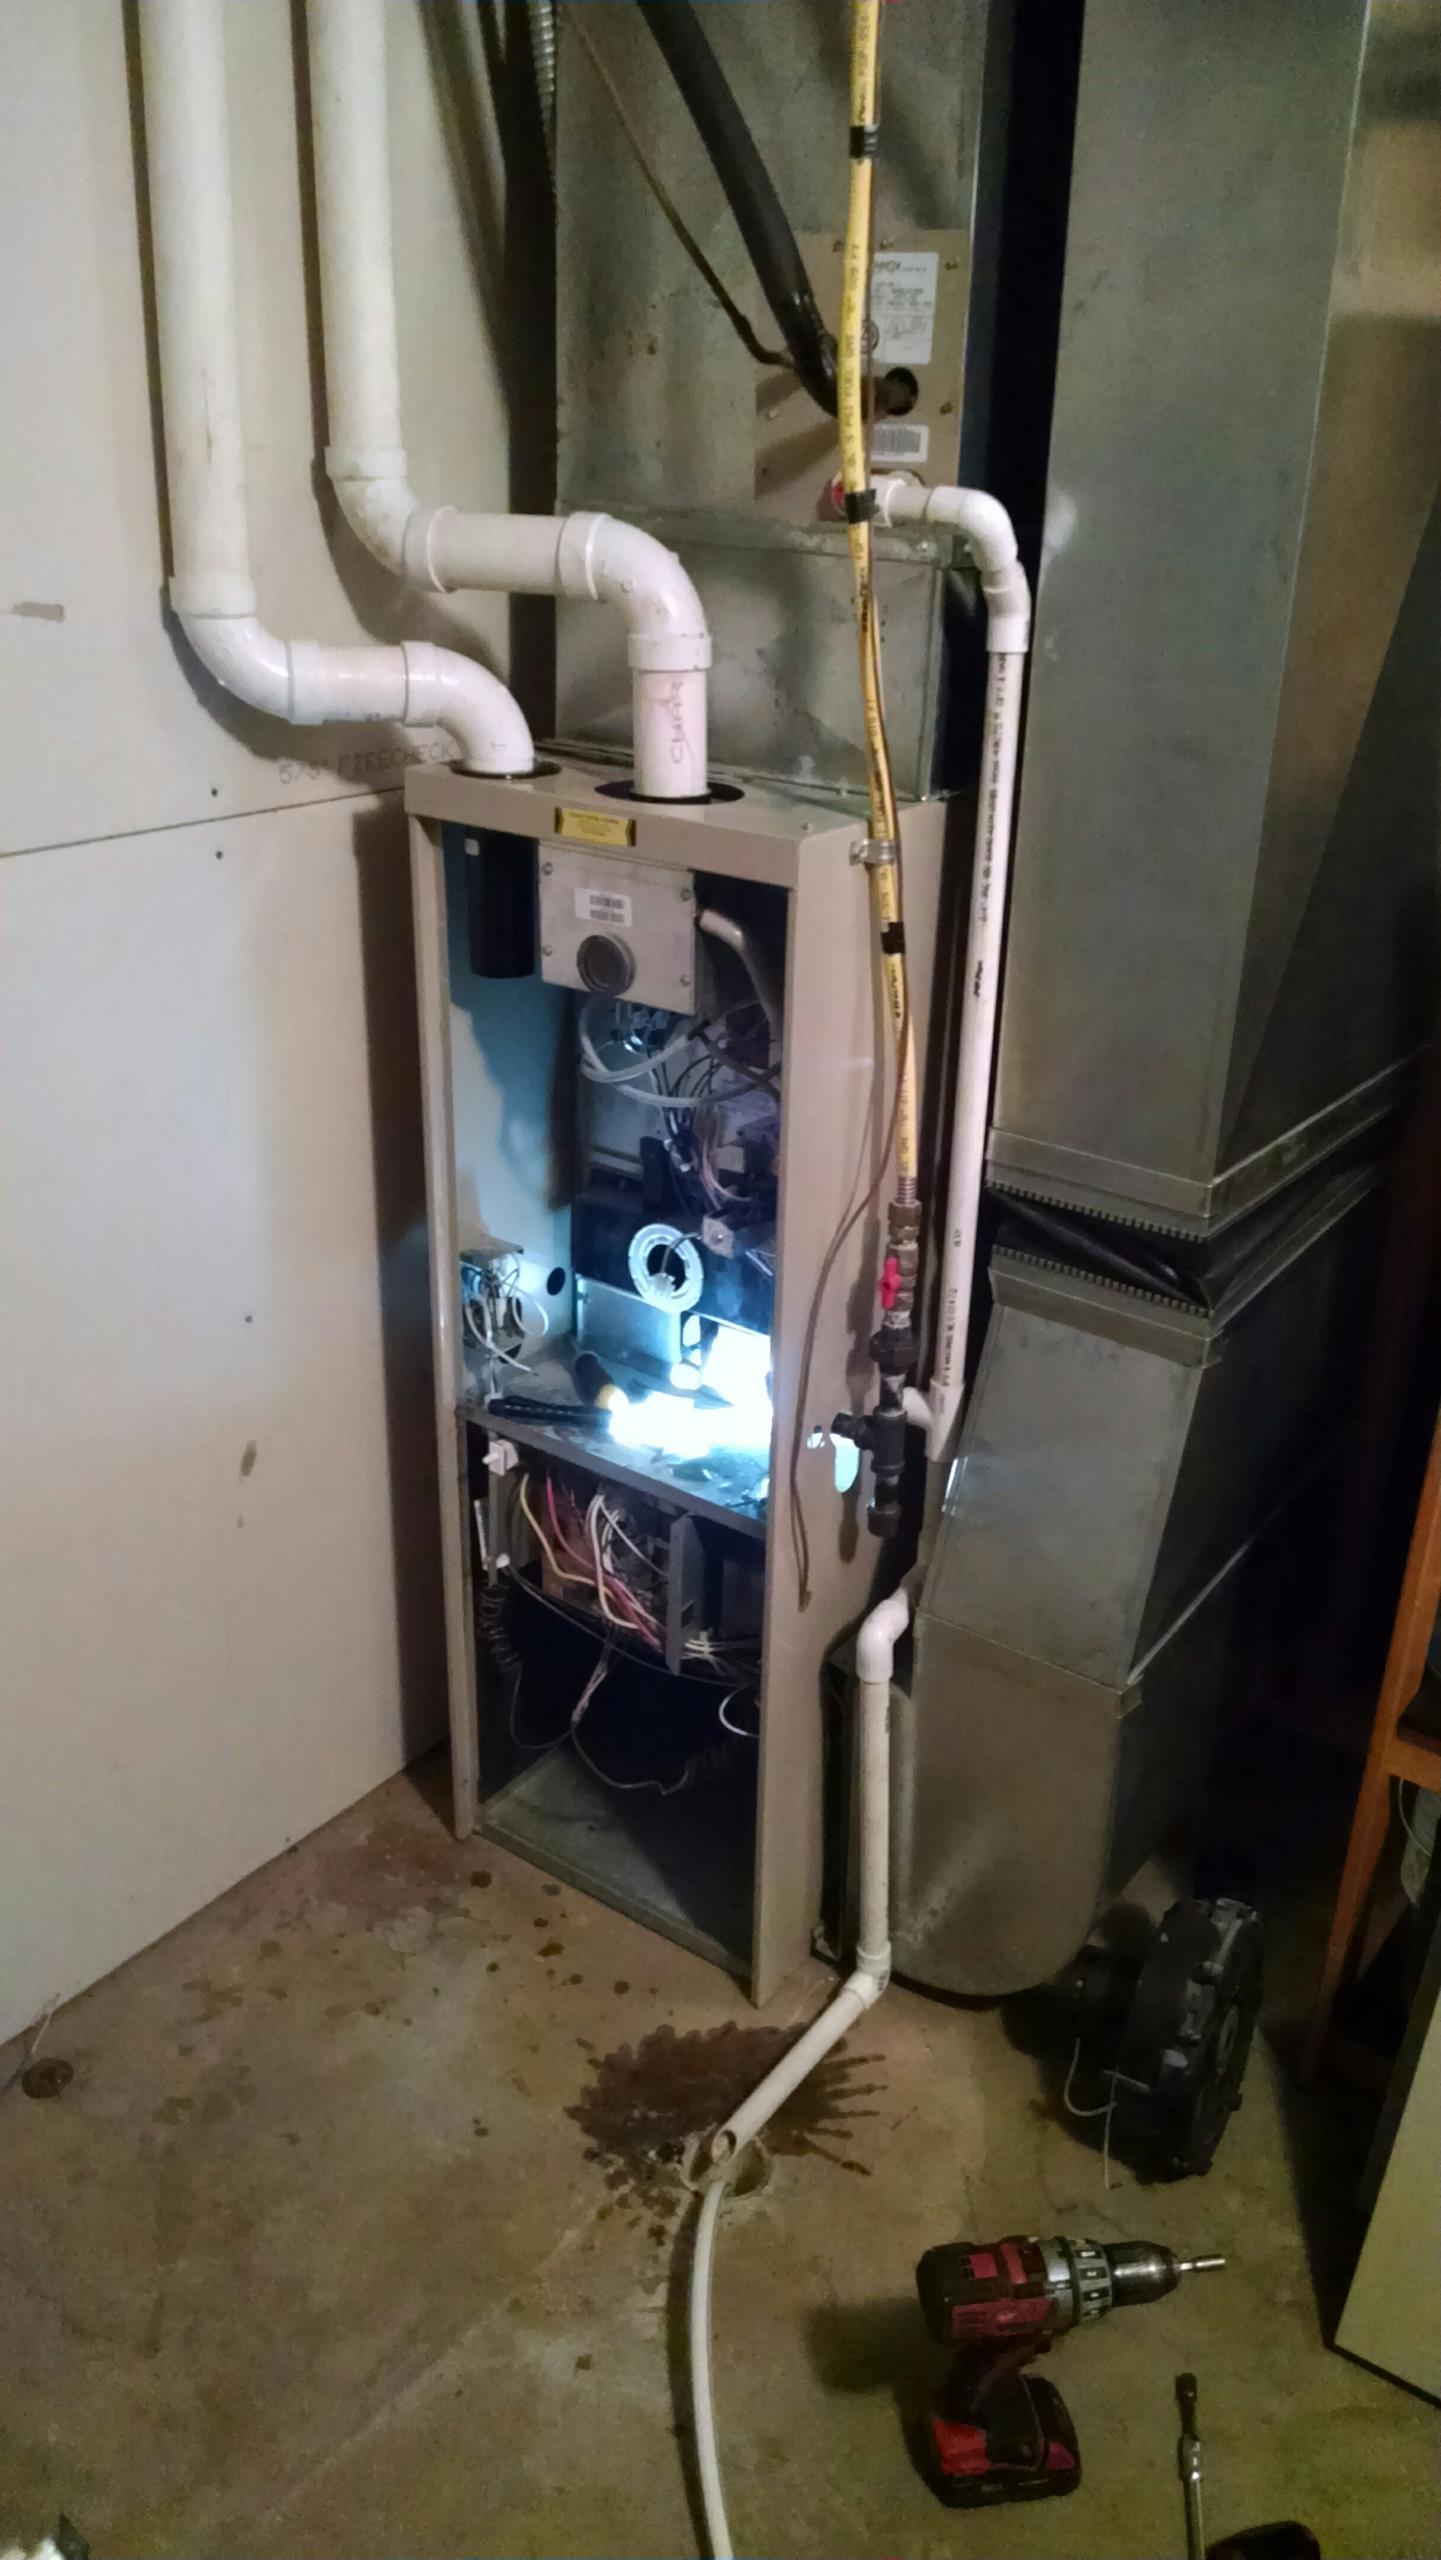 Eau Claire, WI - Troubleshooting furnace problem